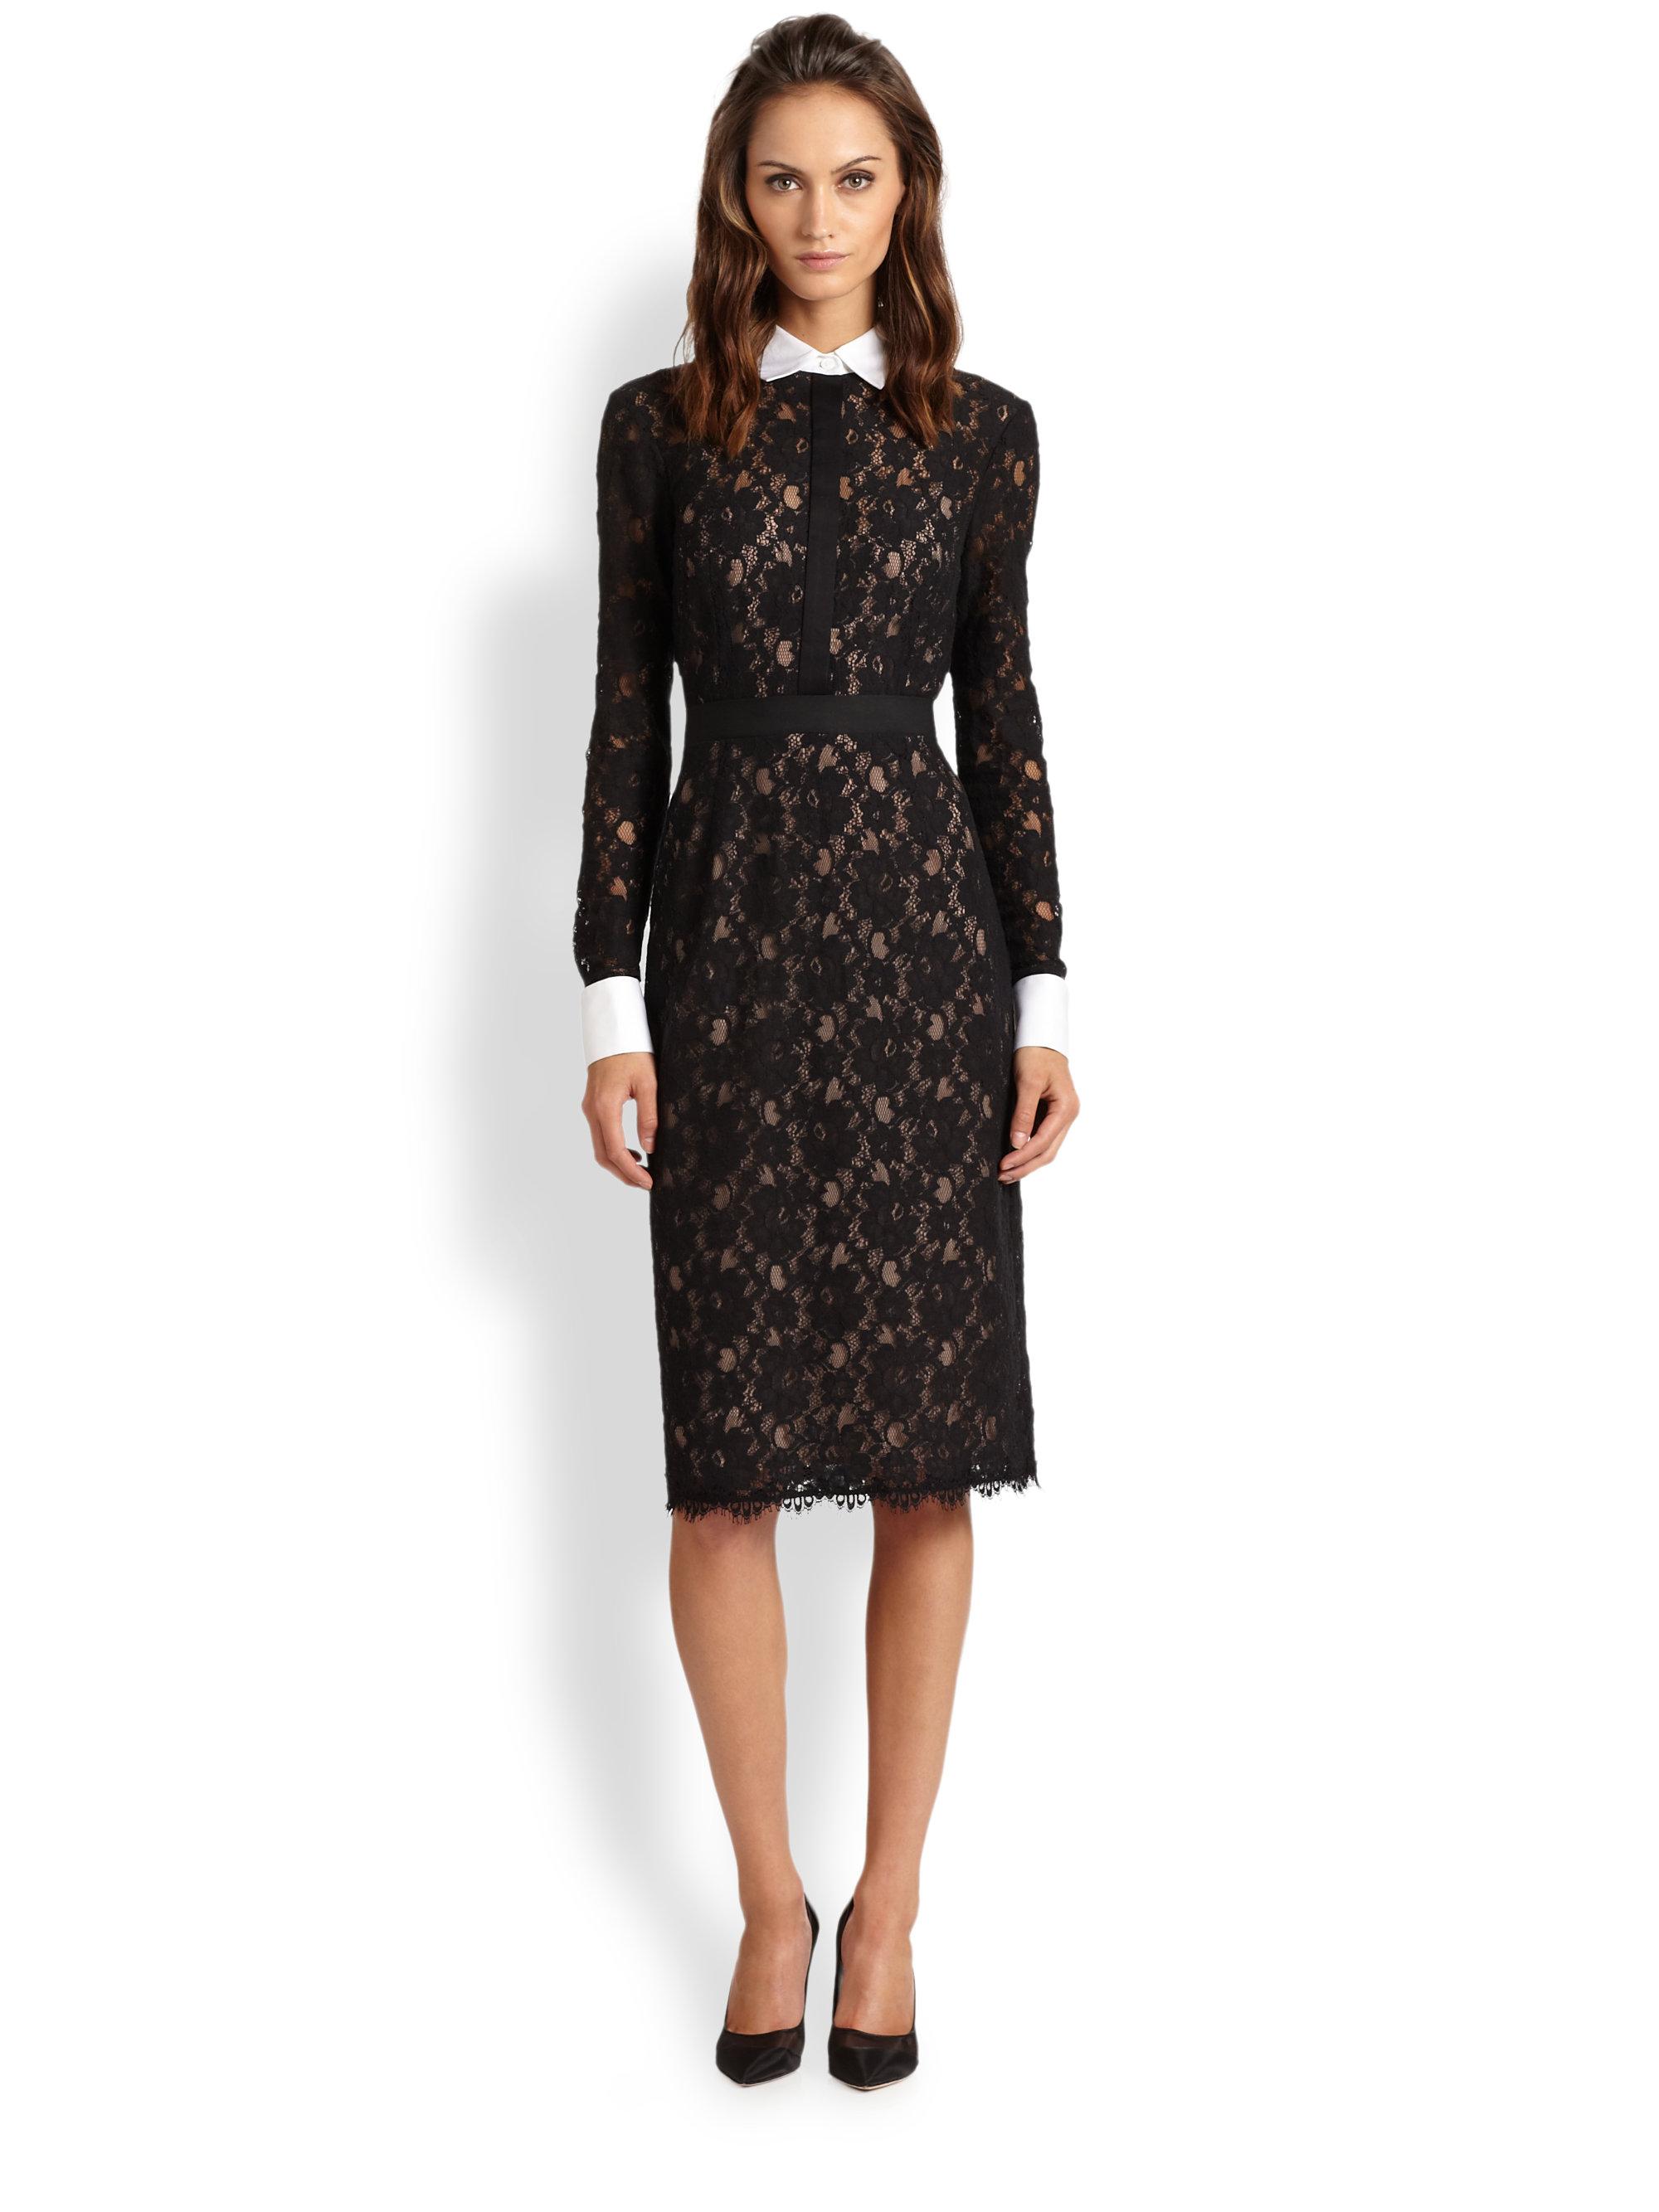 c06781b4194b Bcbg Black Lace Dress Long Sleeve